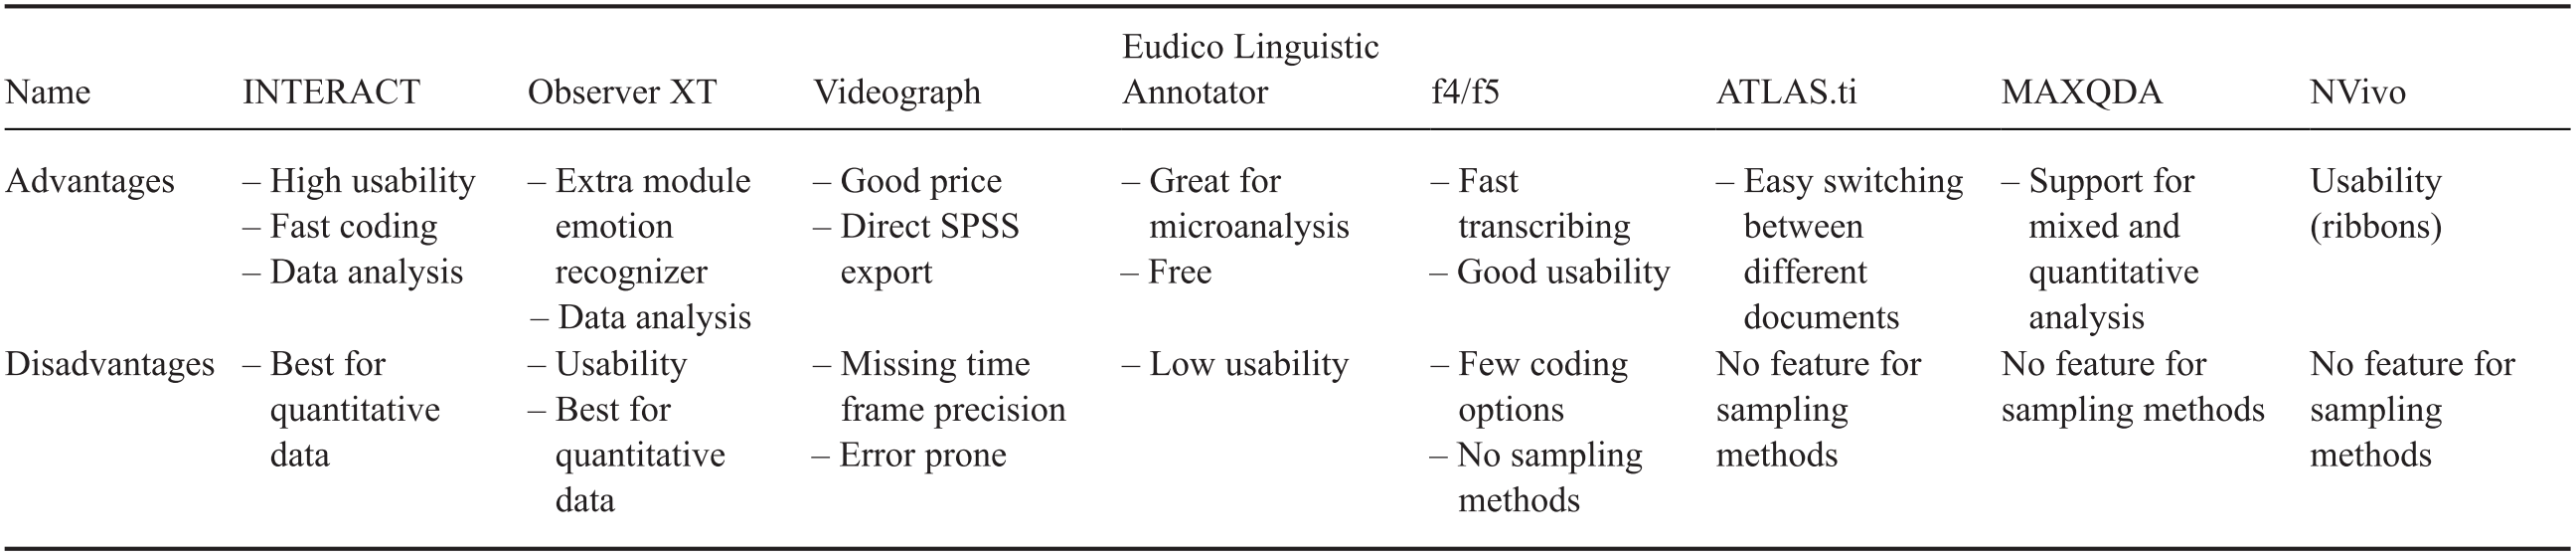 Methodology and Procedures of Interaction Analysis (Part III